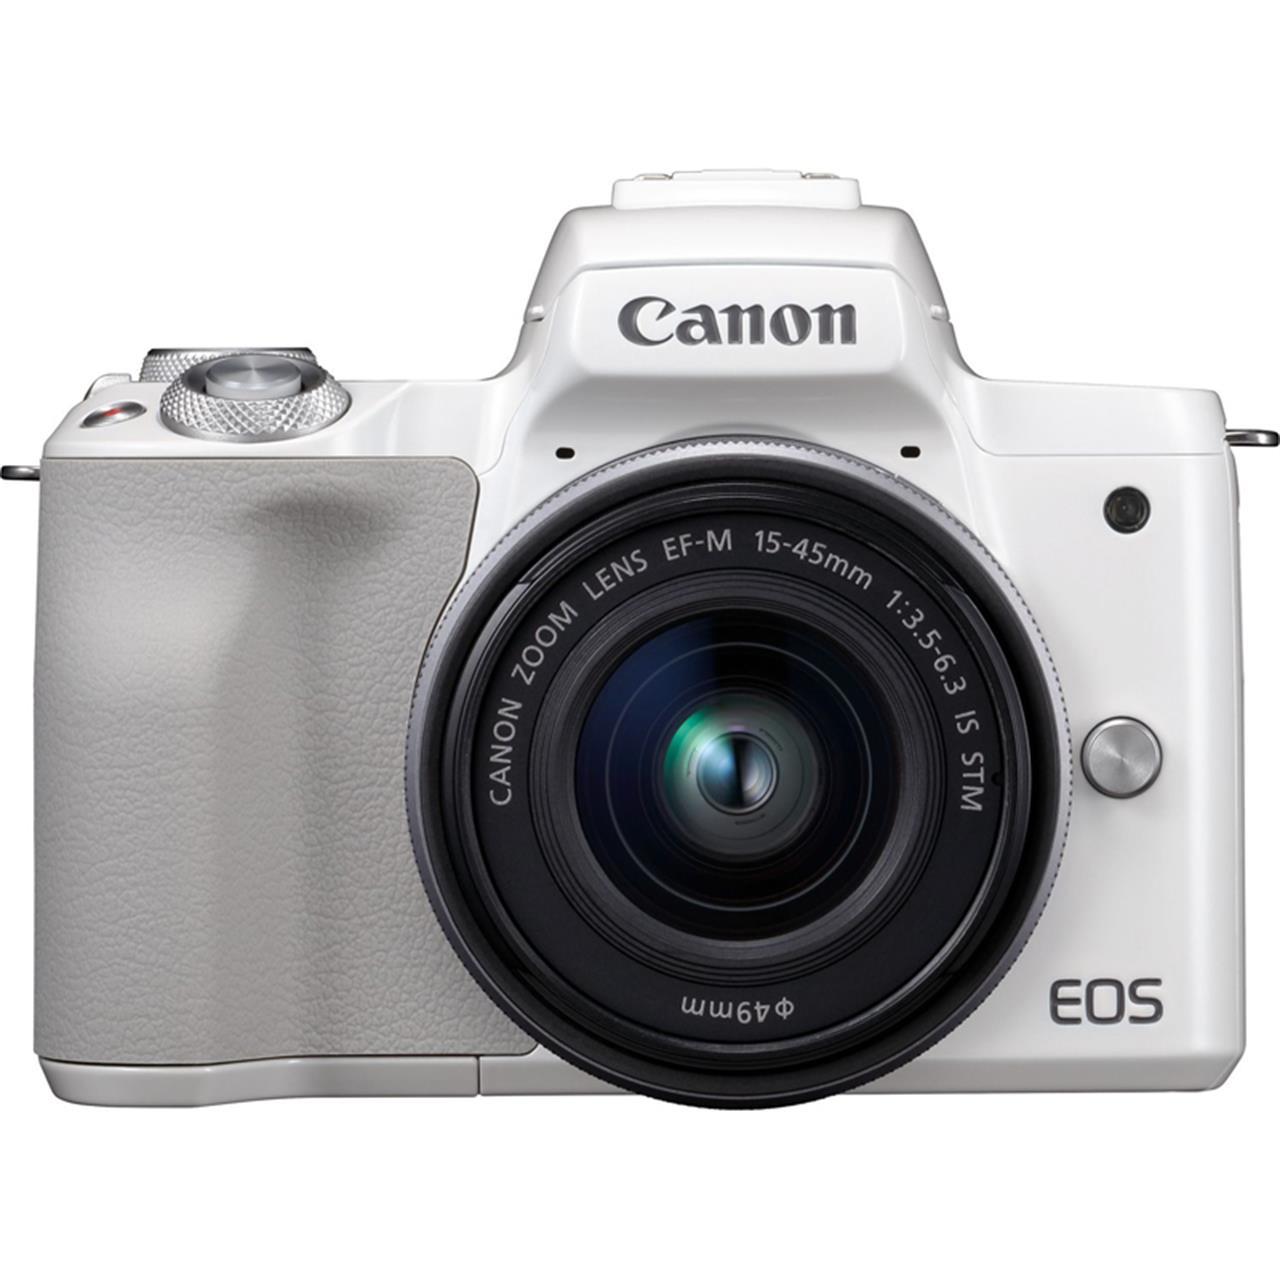 4549292109177__canon_eos_m50_15-45mm_white_hofma.jpg